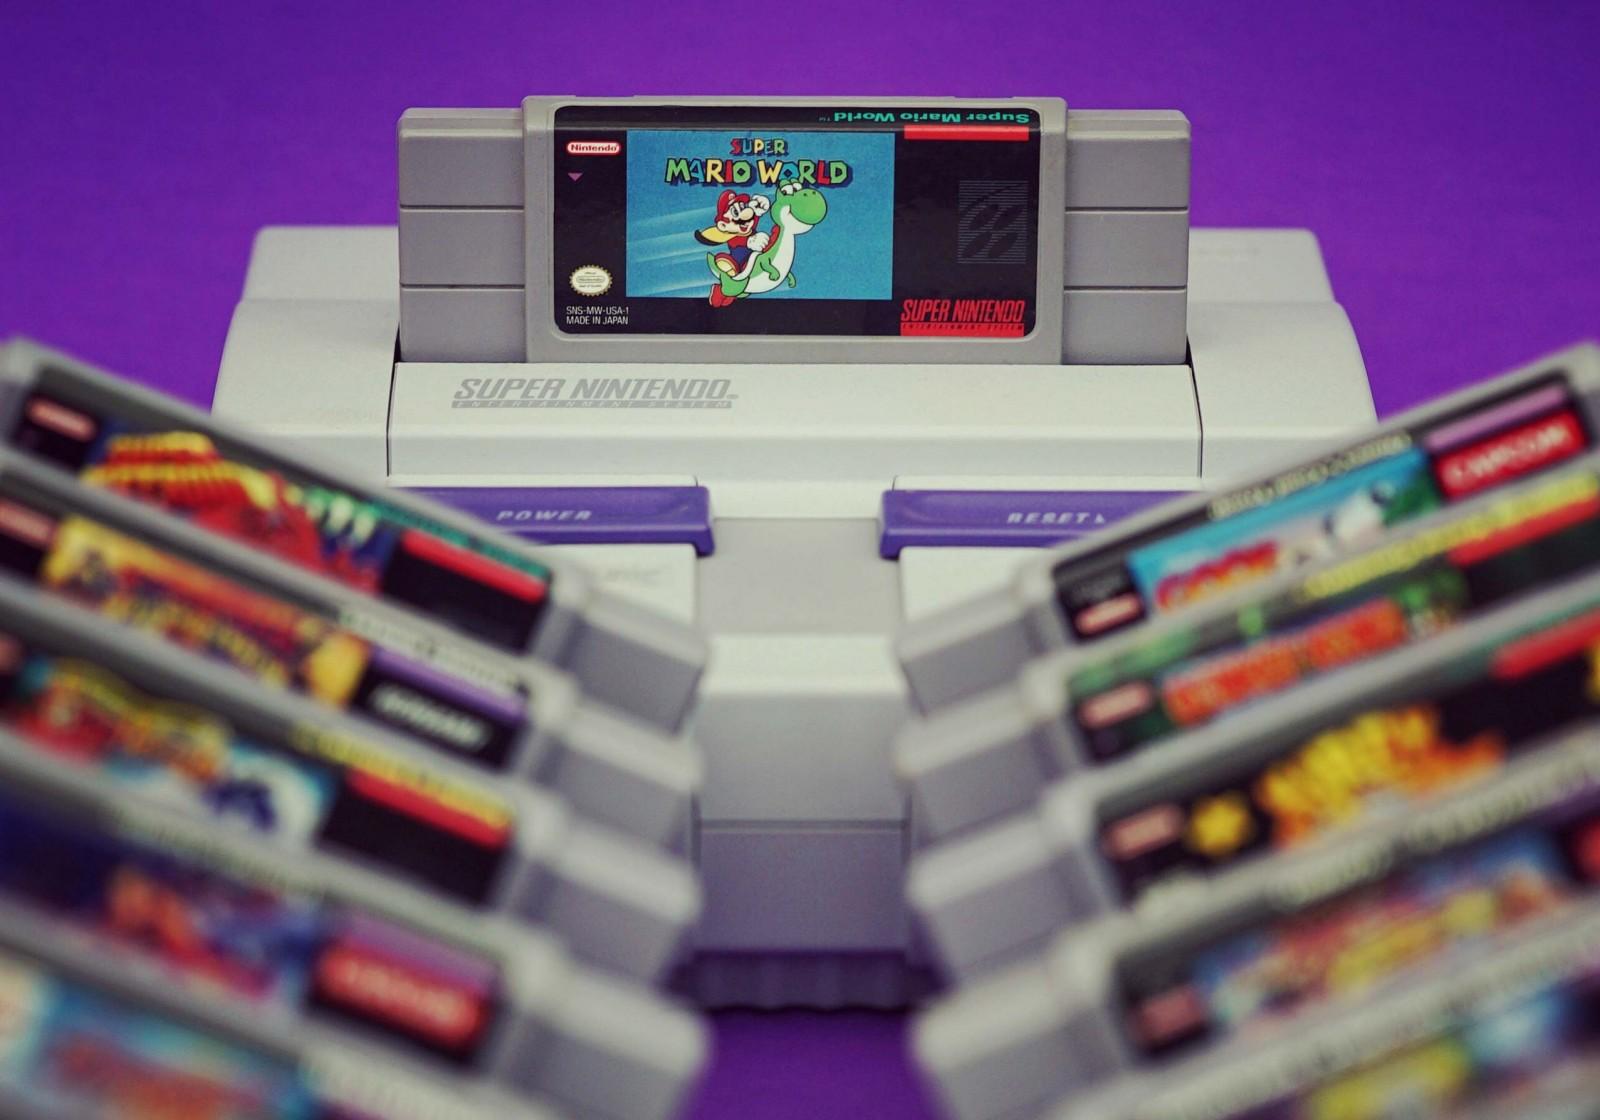 Super Nintendo (SNES) 101: A Beginners Guide